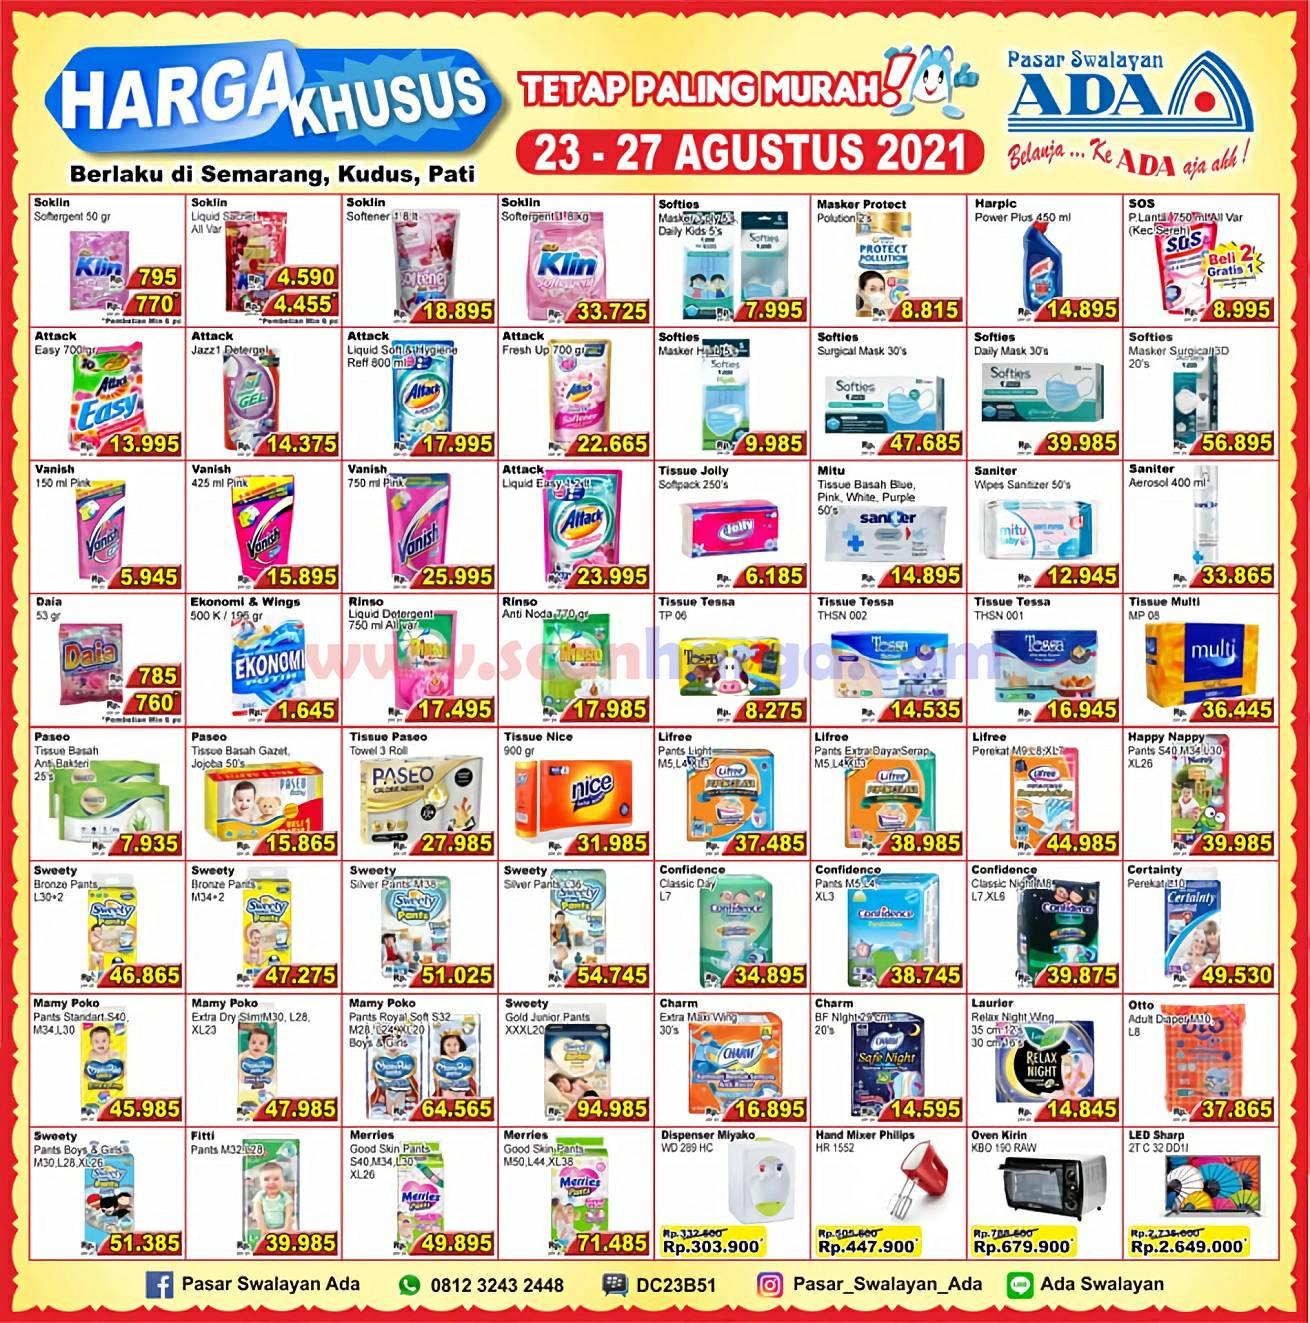 Promo Katalog Ada Swalayan Weekday Harga Khusus 23 - 27 Agustus 2021 2